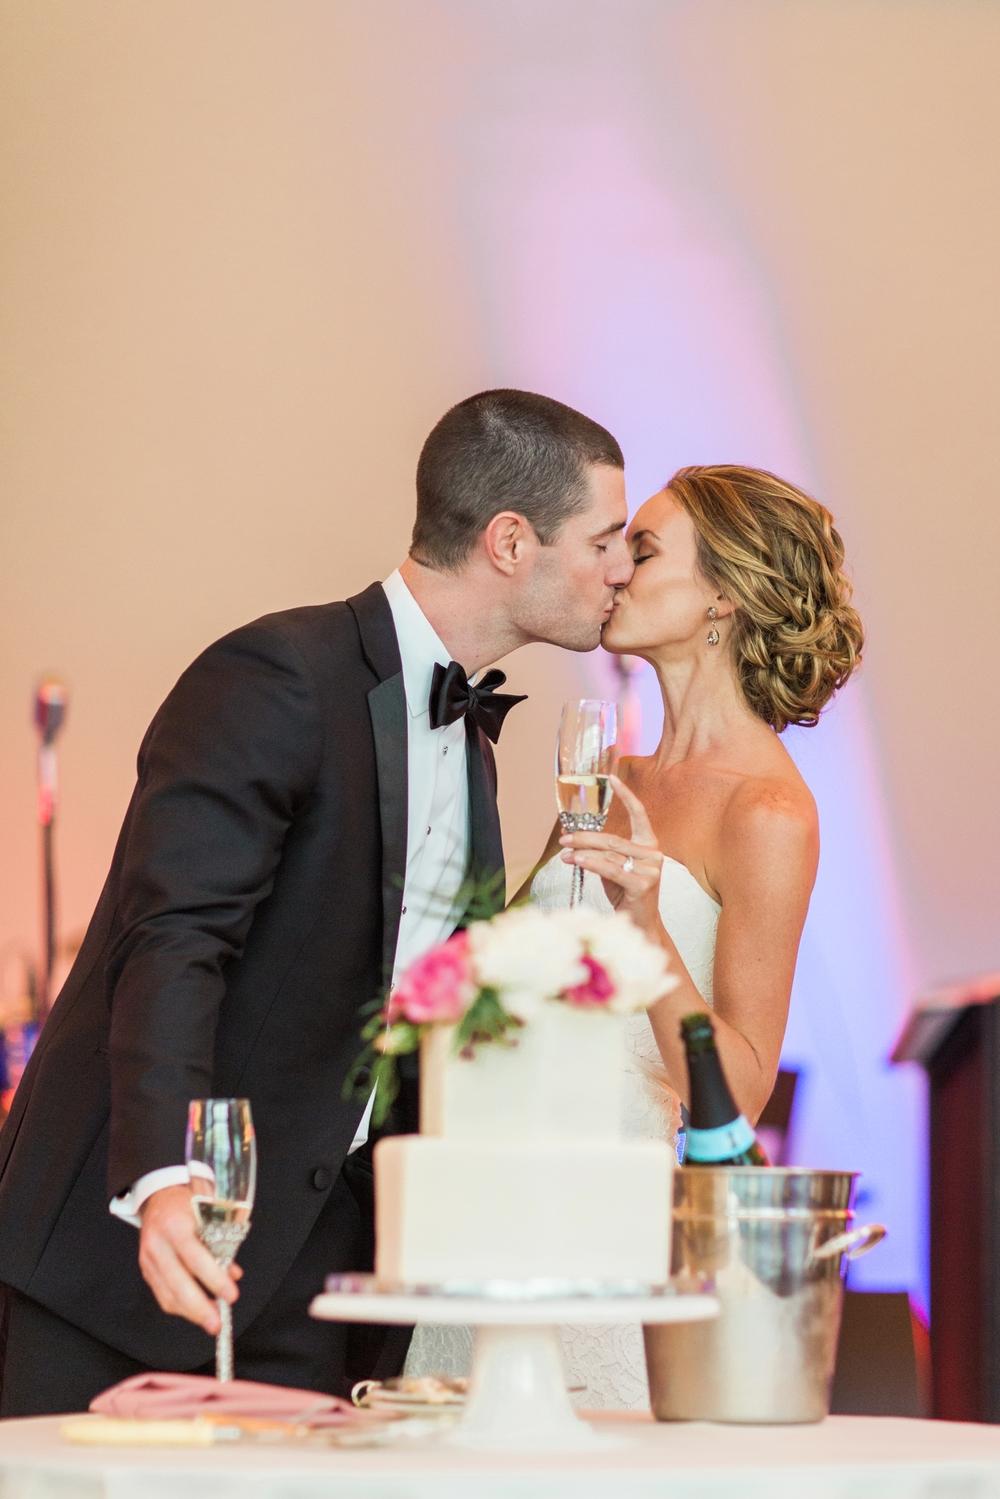 St_Joan_of_Arc_Indianapolis_Sahms_Atrium_Indiana_Wedding_Photography_Chloe_Luka_Photography_6667.jpg